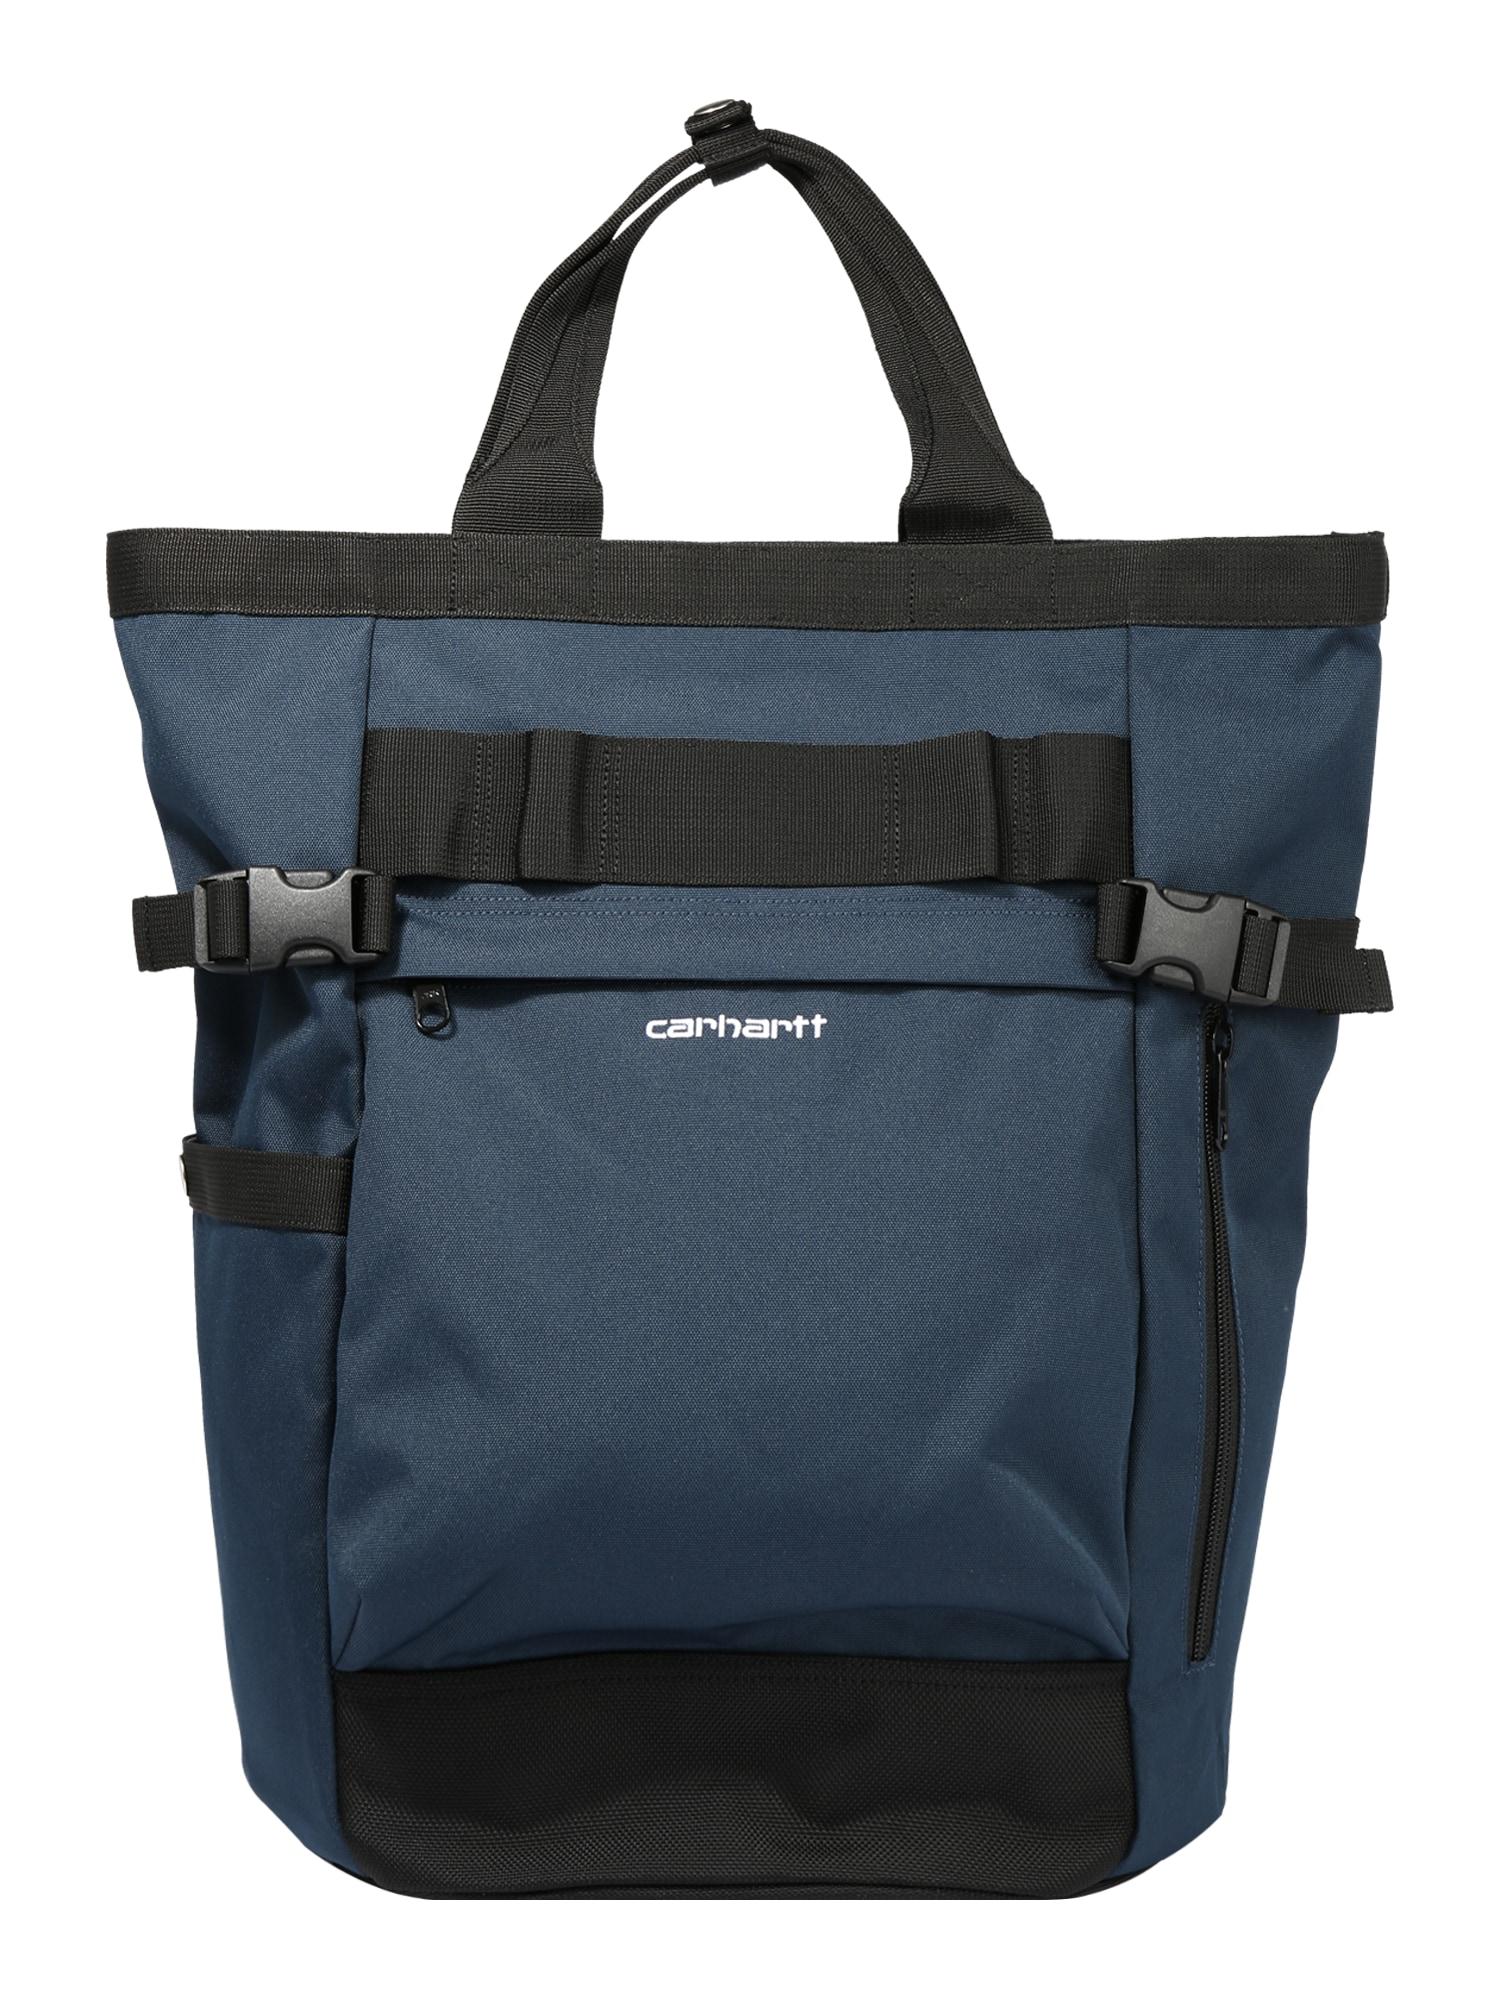 Carhartt WIP Batoh 'Payton'  bílá / černá / chladná modrá